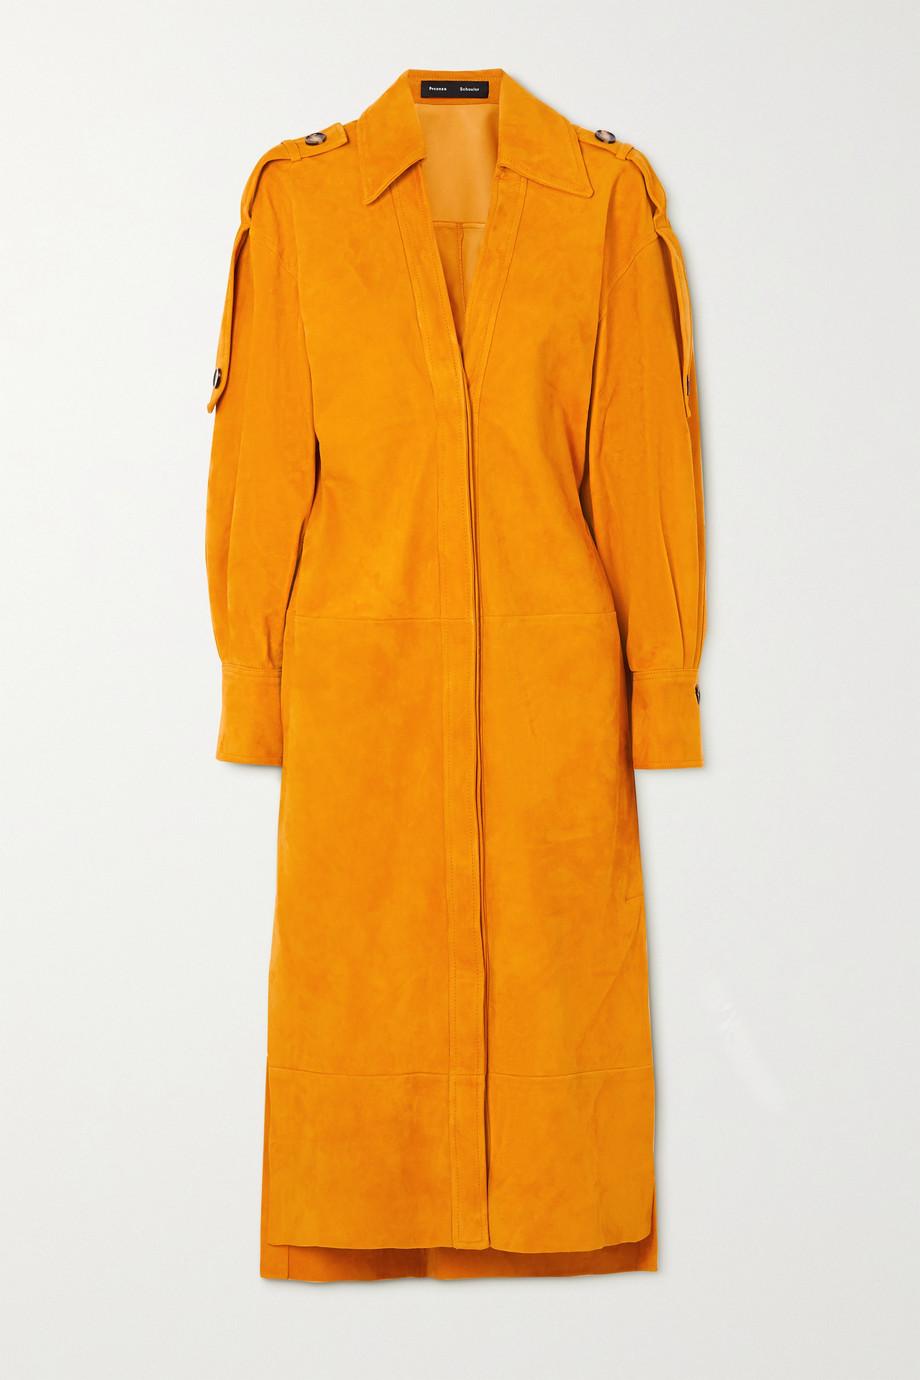 Proenza Schouler Hemdblusenkleid aus Veloursleder